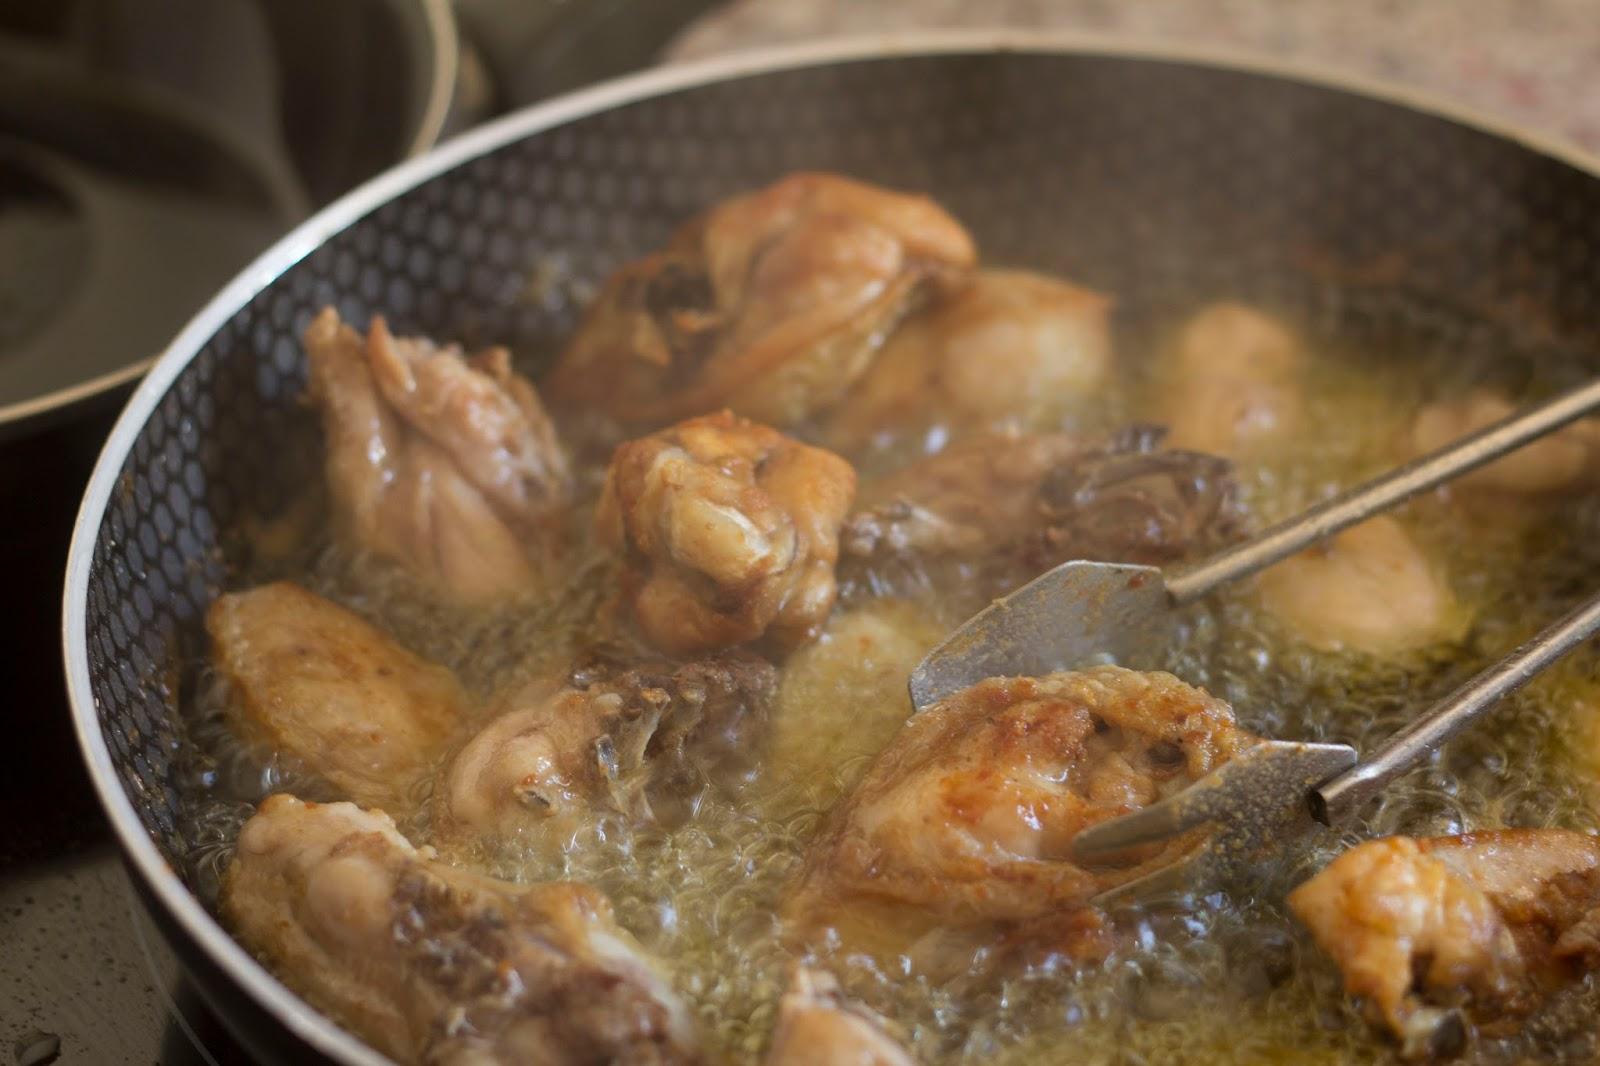 receta de pollo al ajillo